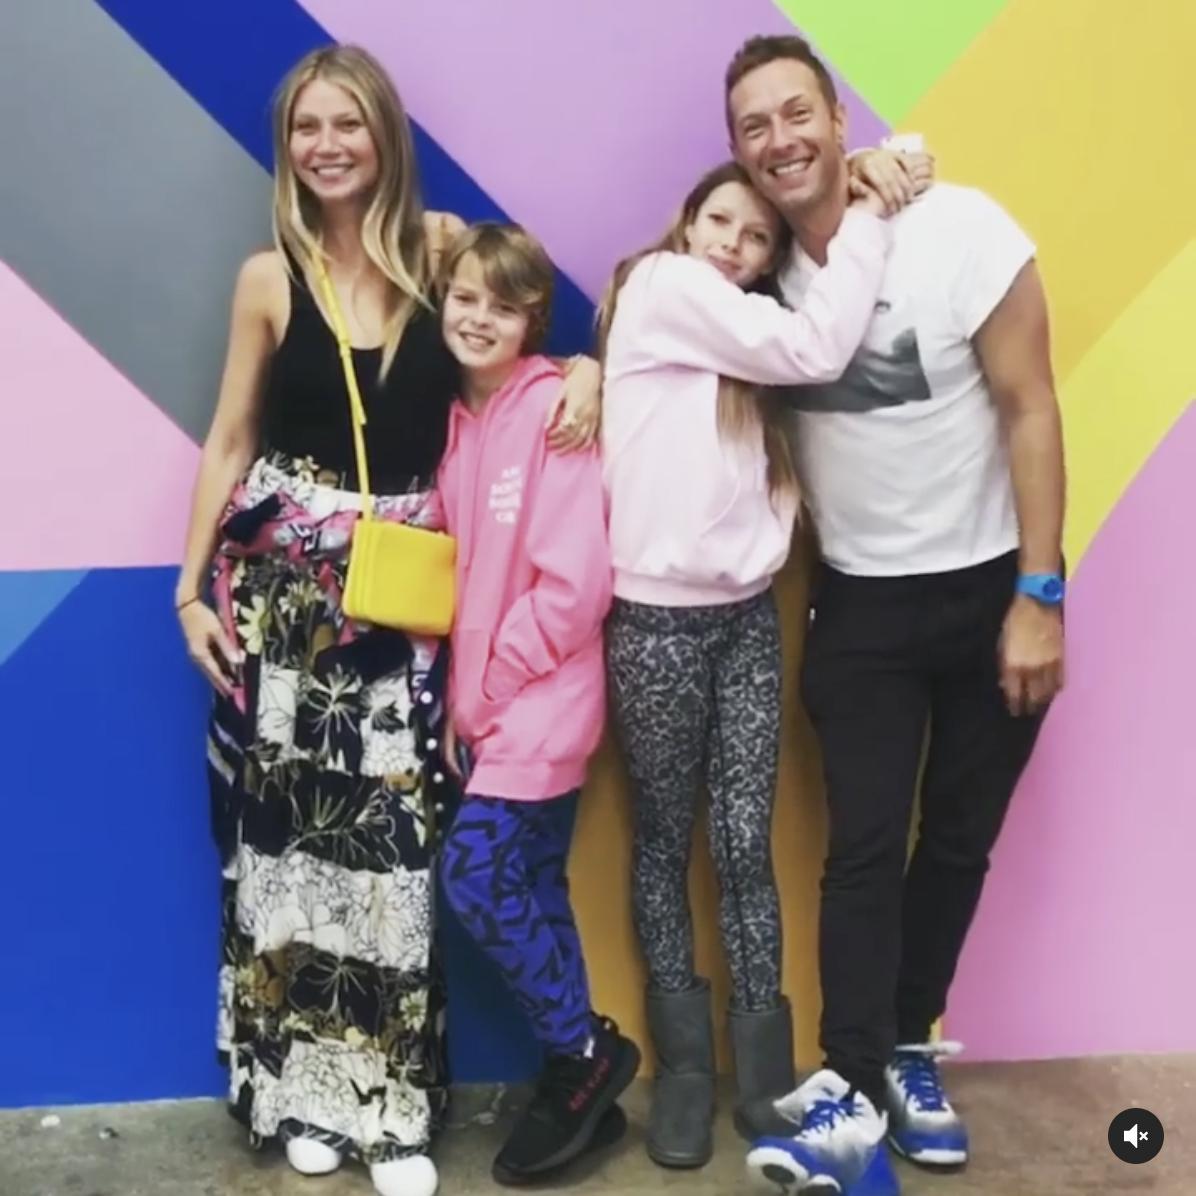 Gwyneth Paltrow, Chris Martin, and kids